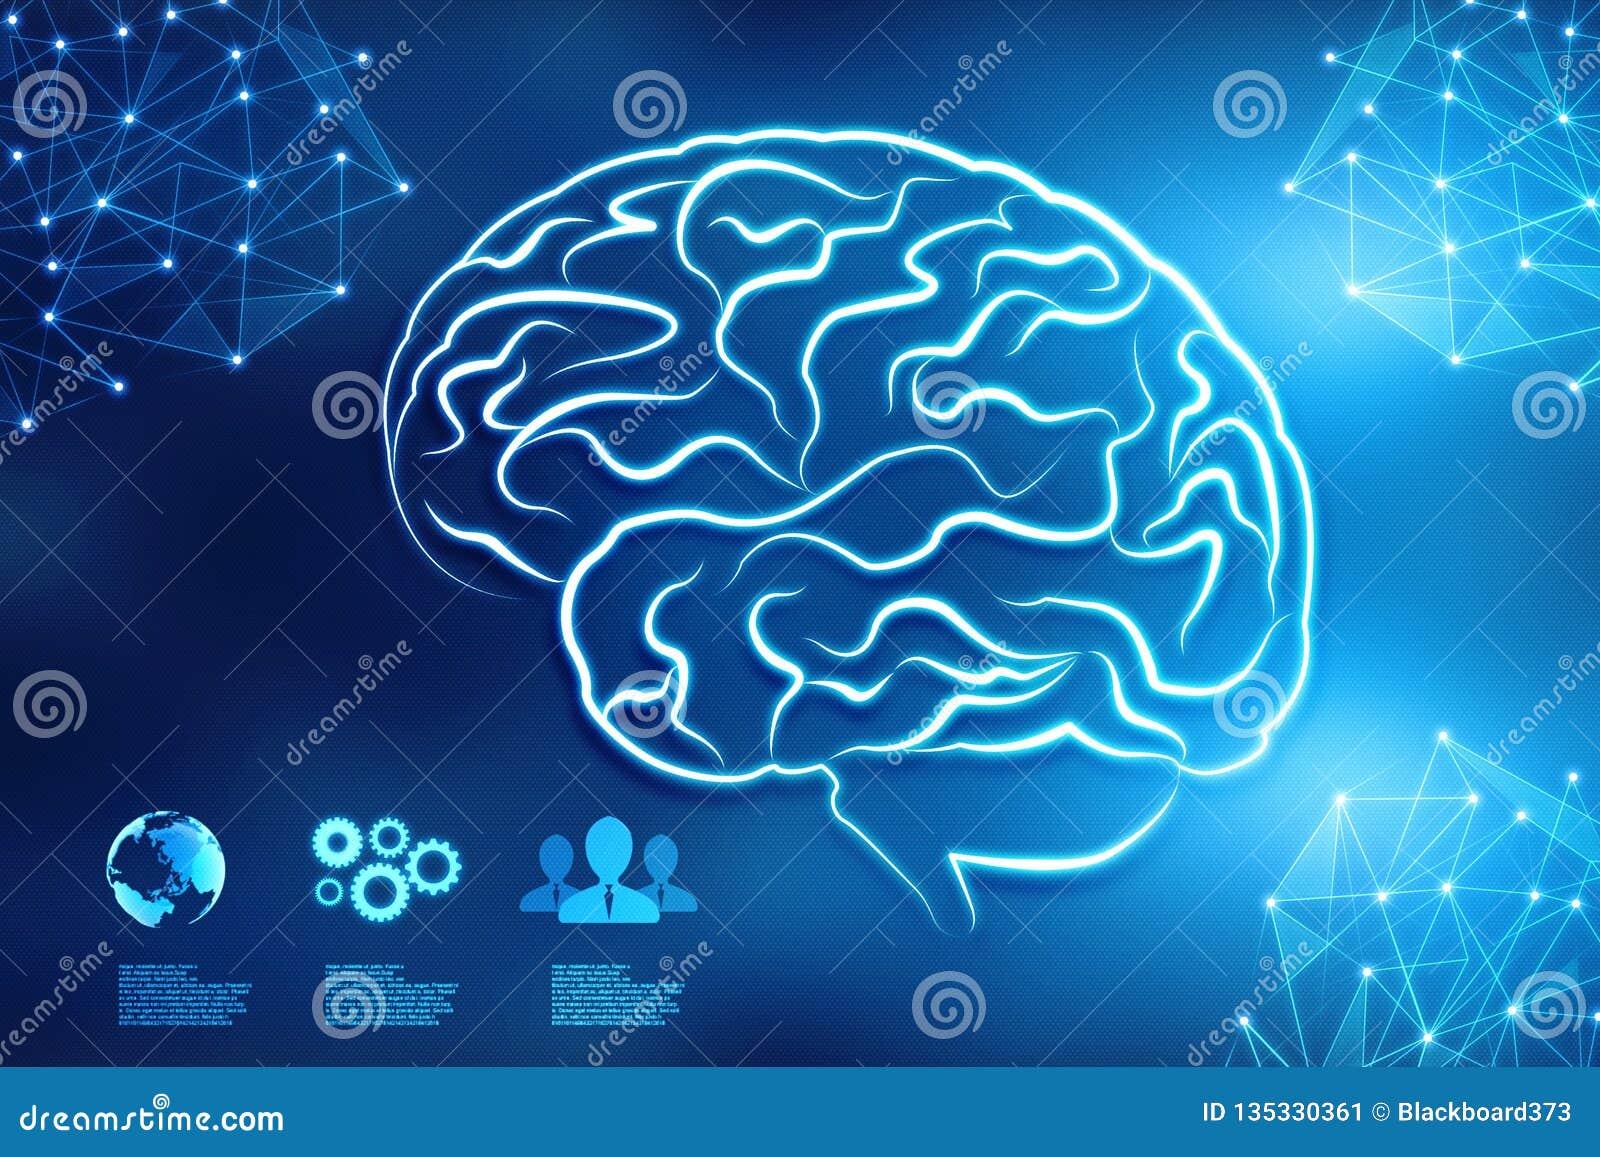 Digital illustration of Human brain structure, Creative brain concept background, innovation background